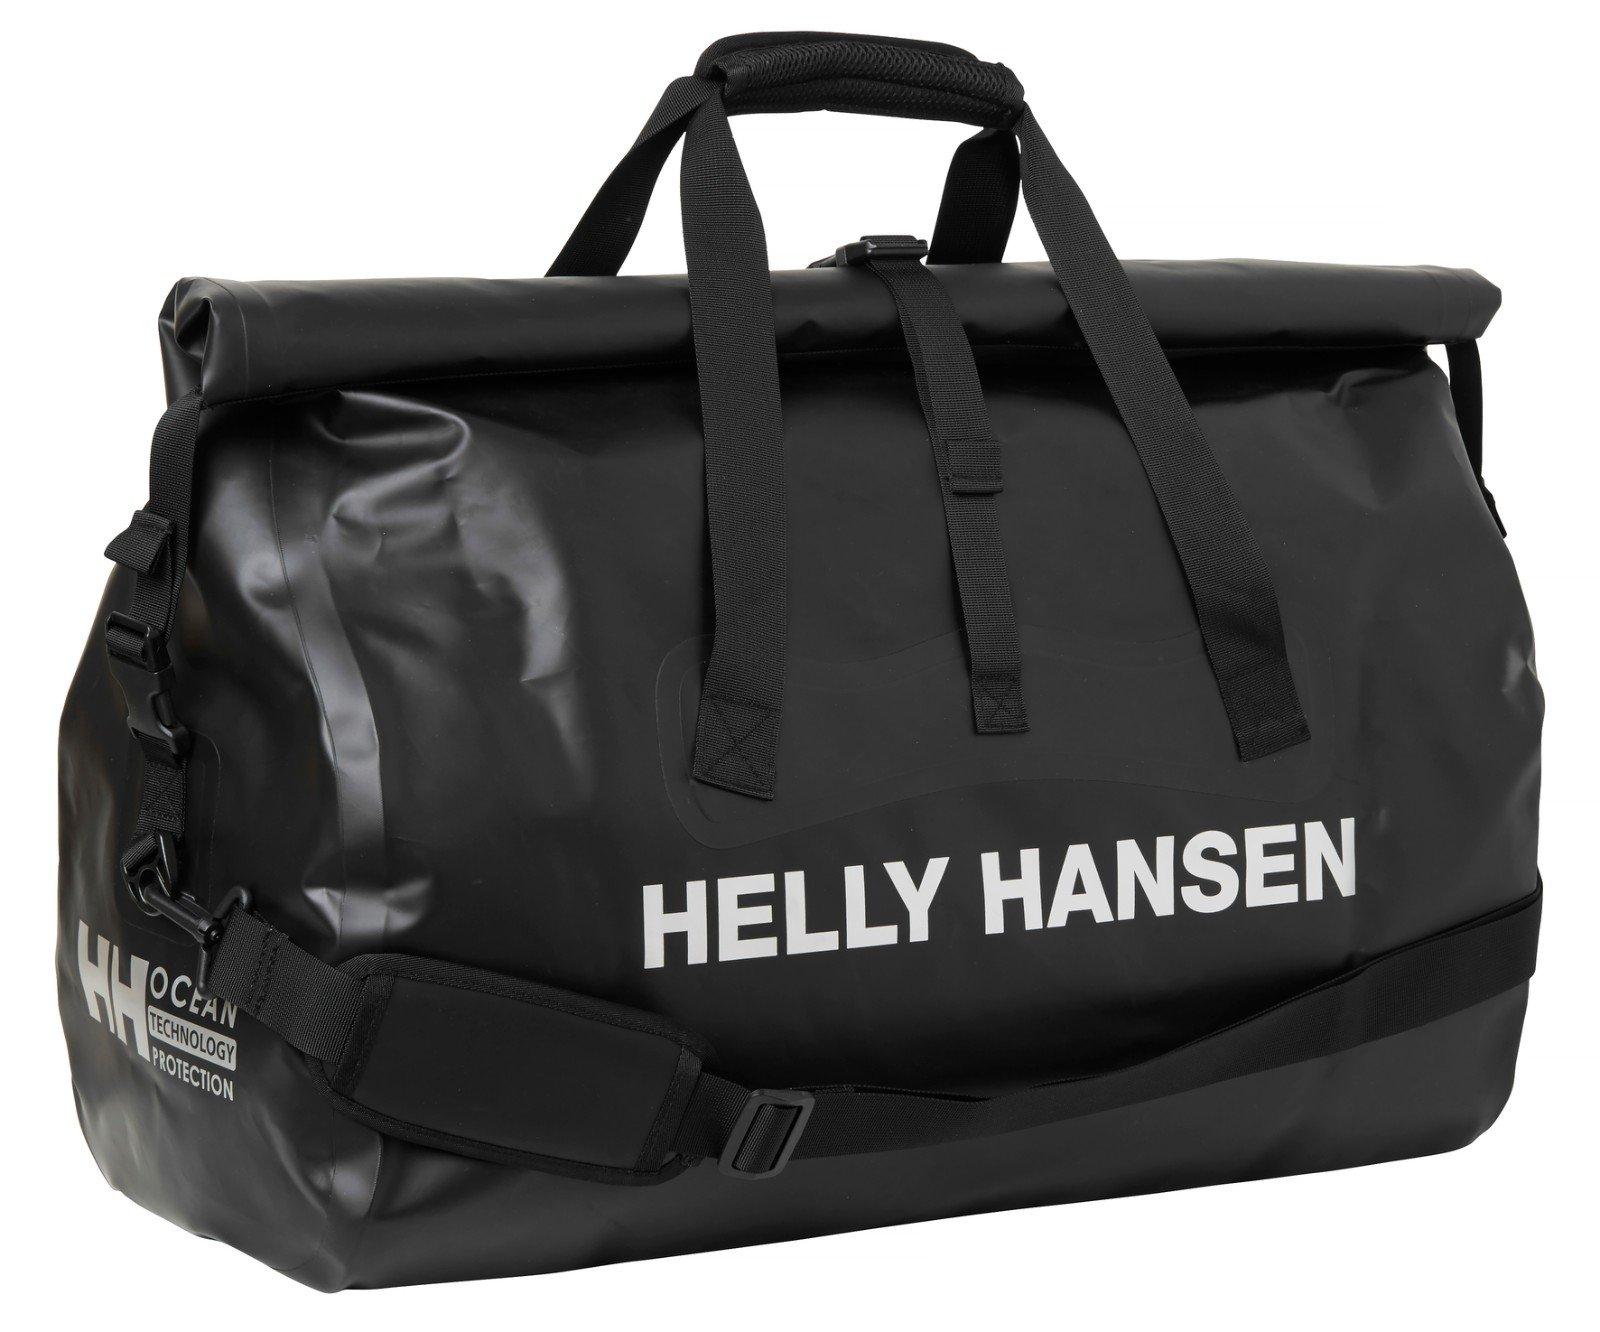 Helly Hansen Sailing Duffel Bag, Black, Standard